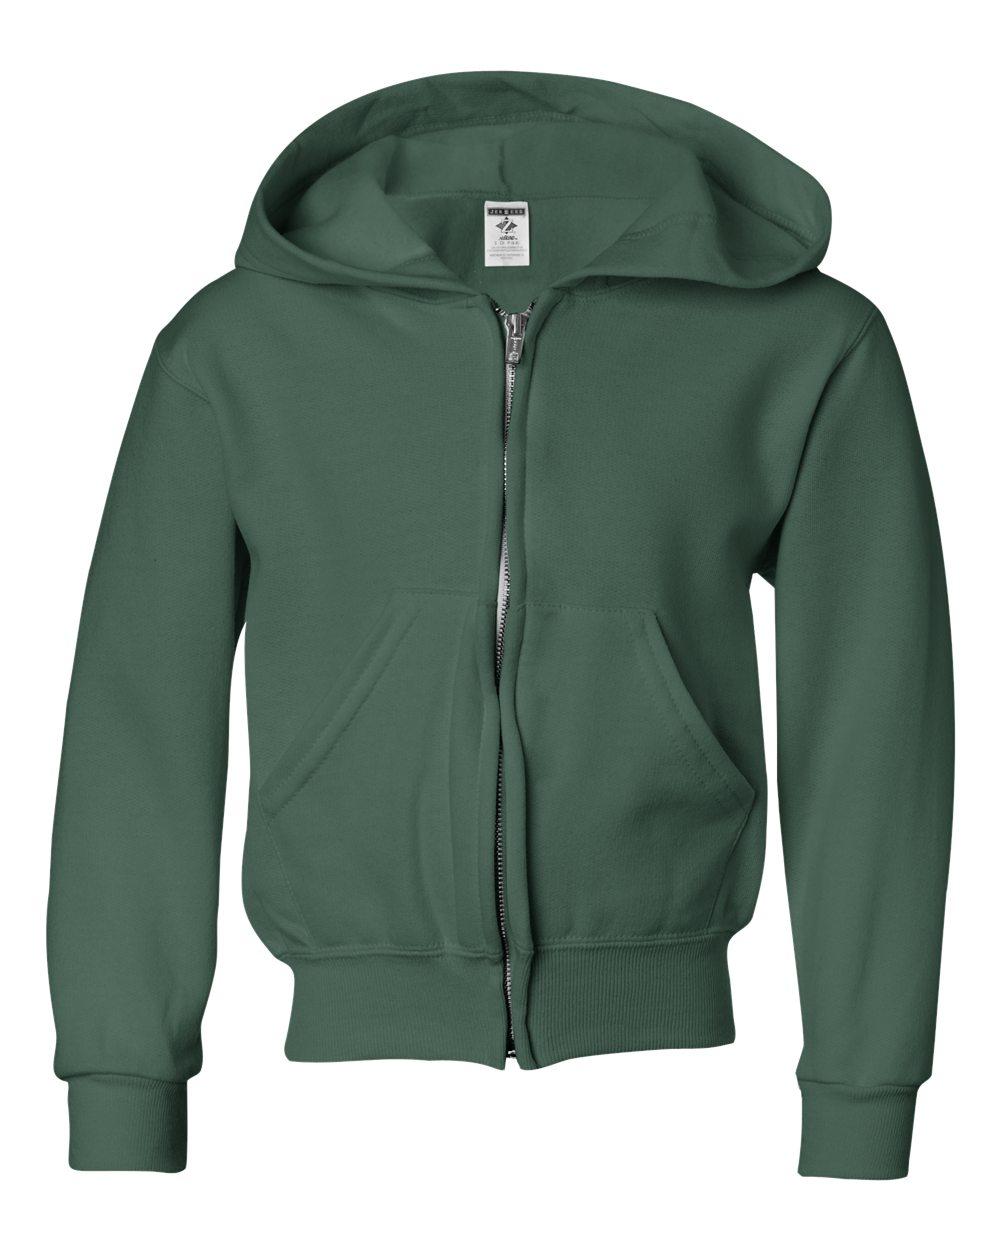 Picture of Jerzees Nublend Youth Full-Zip Hooded Sweatshirt